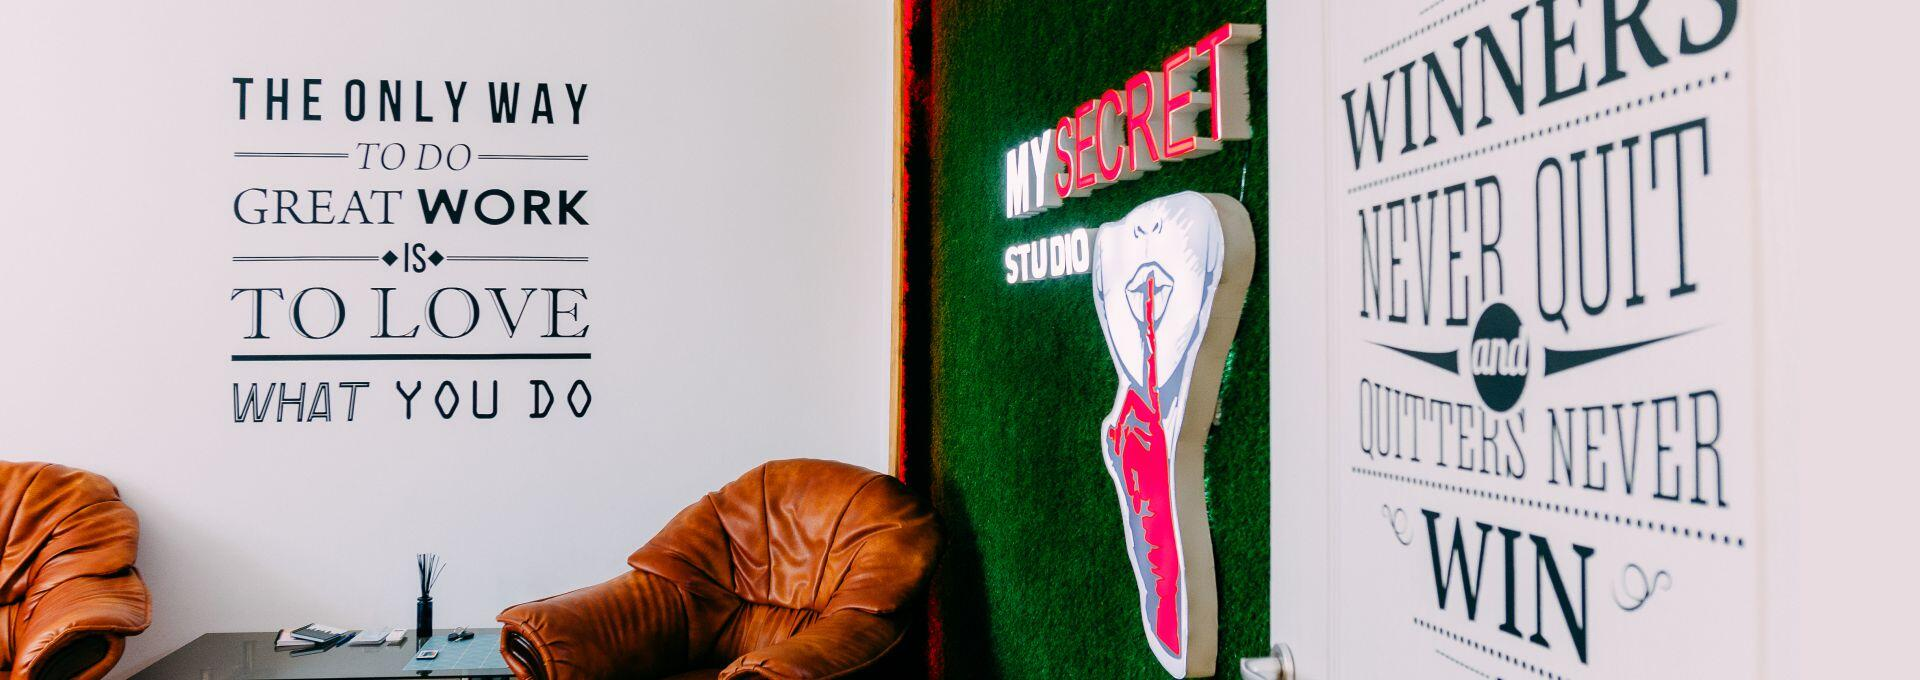 MySecret studio videochat bucuresti